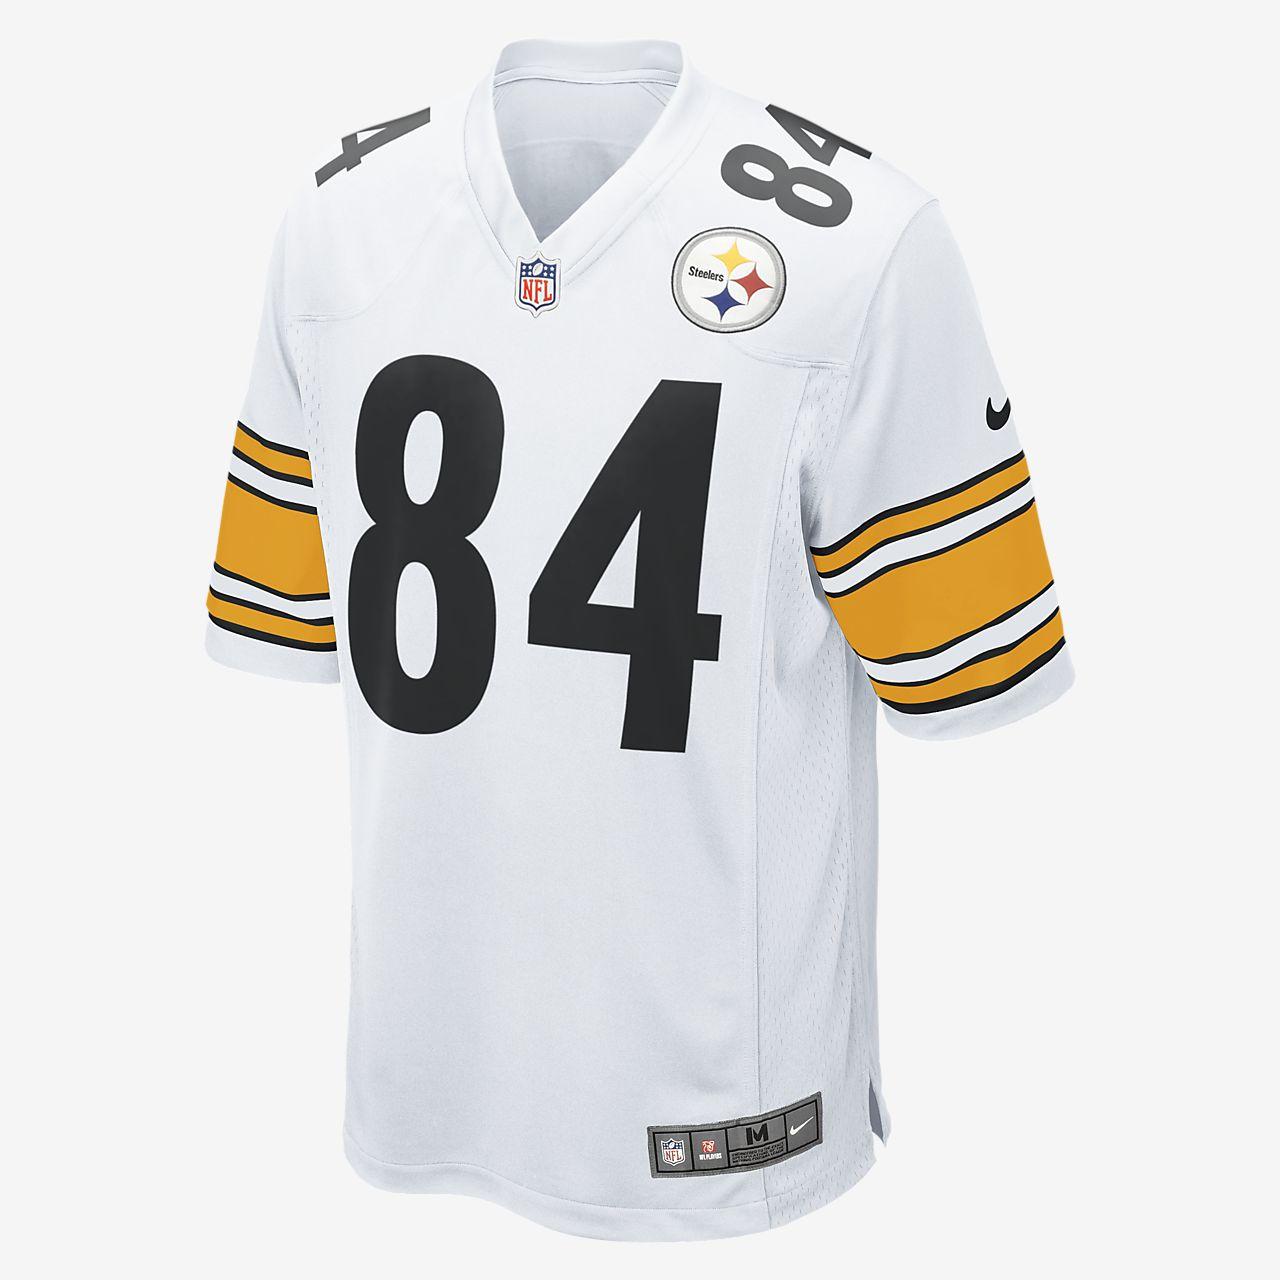 NFL Pittsburgh Steelers (Antonio Brown) American-Football-Spieltrikot für Herren